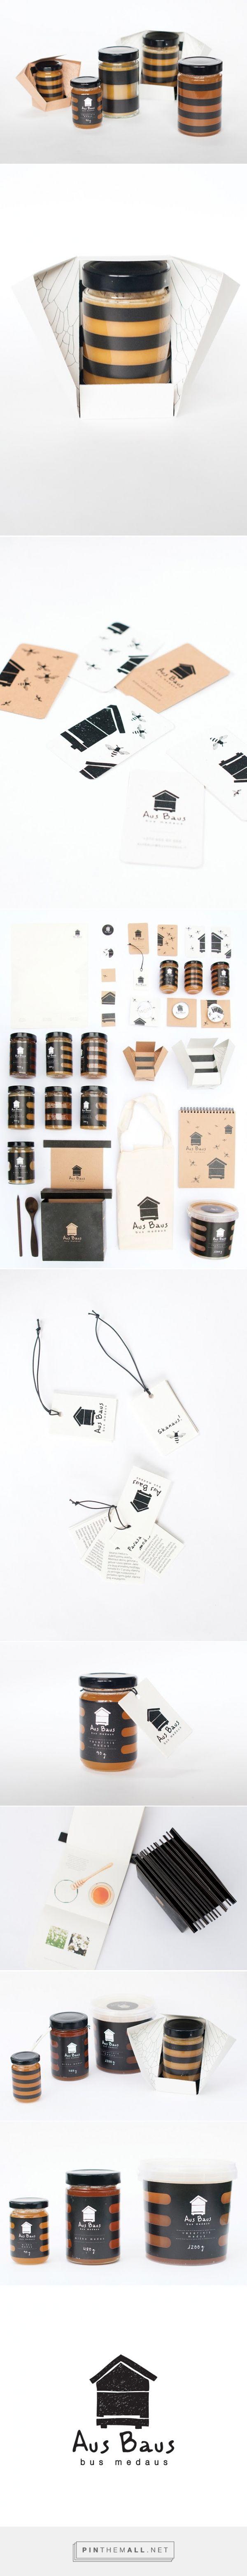 Aus Baus bus medaus #Honey #concept by Gabija Platukyte - http://www.packagingoftheworld.com/2015/01/aus-baus-bus-medaus-honey-student.html